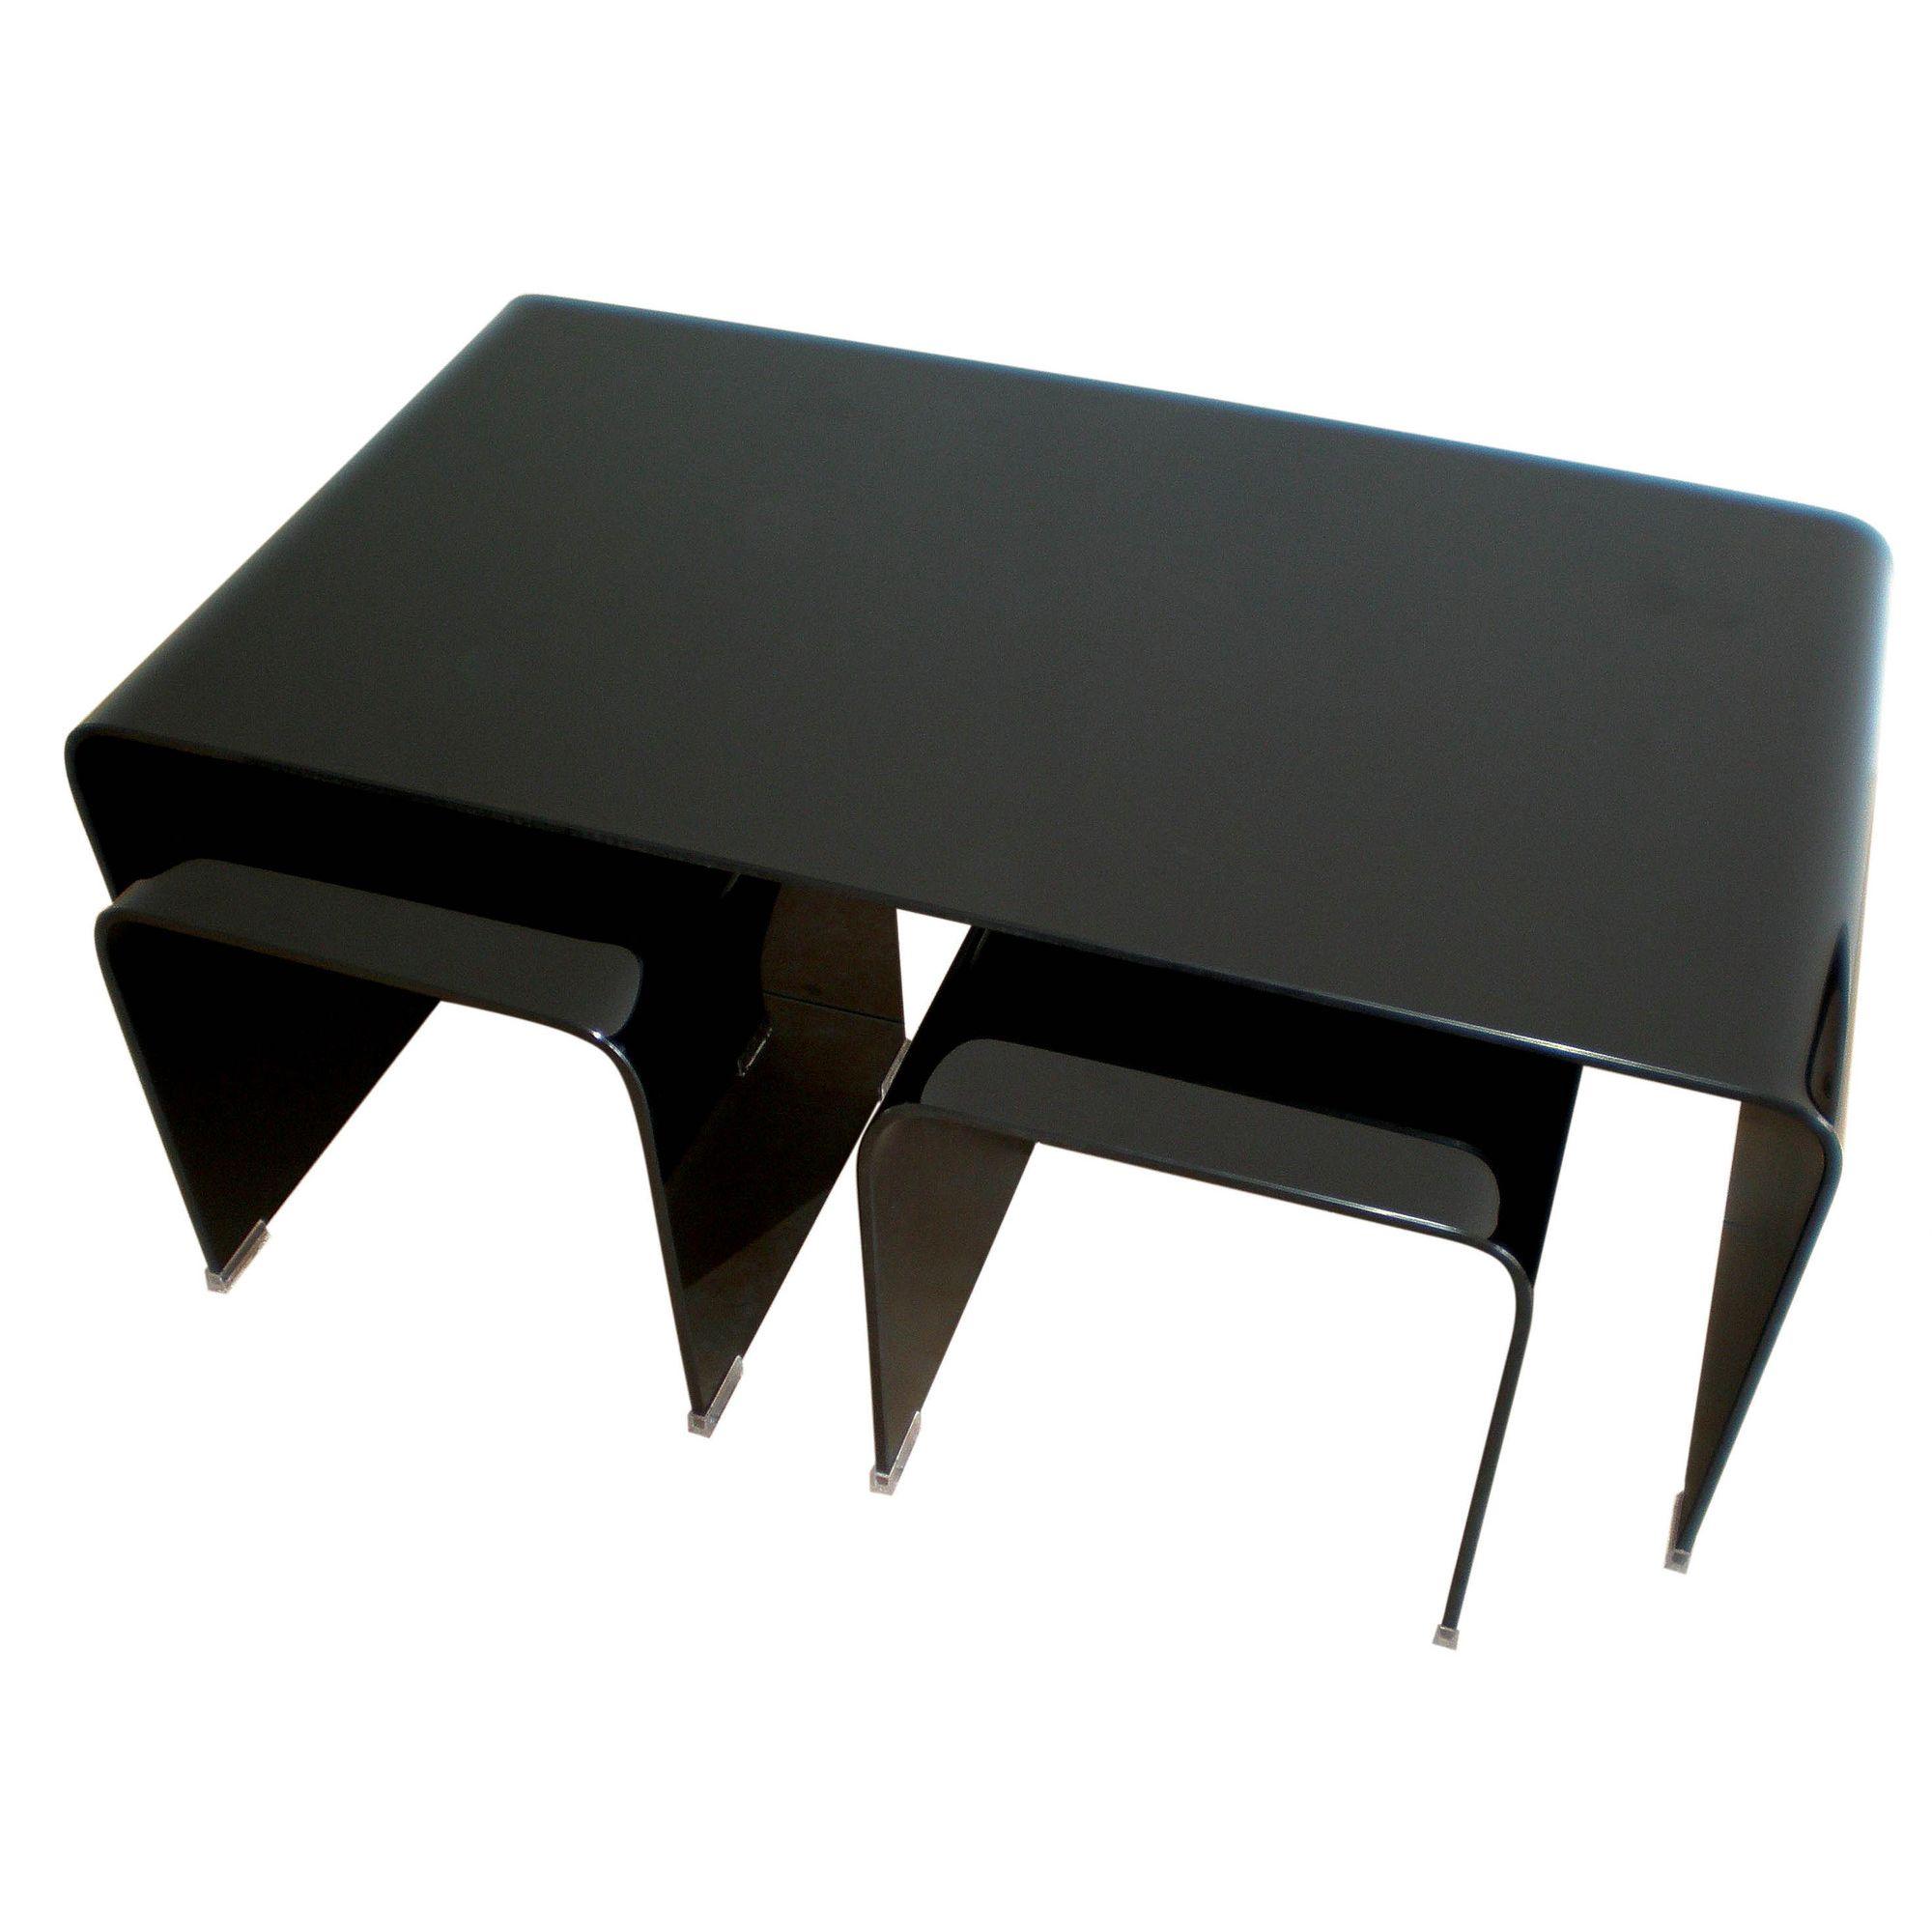 Premier Housewares Long John 3 Piece Nest of Tables at Tesco Direct